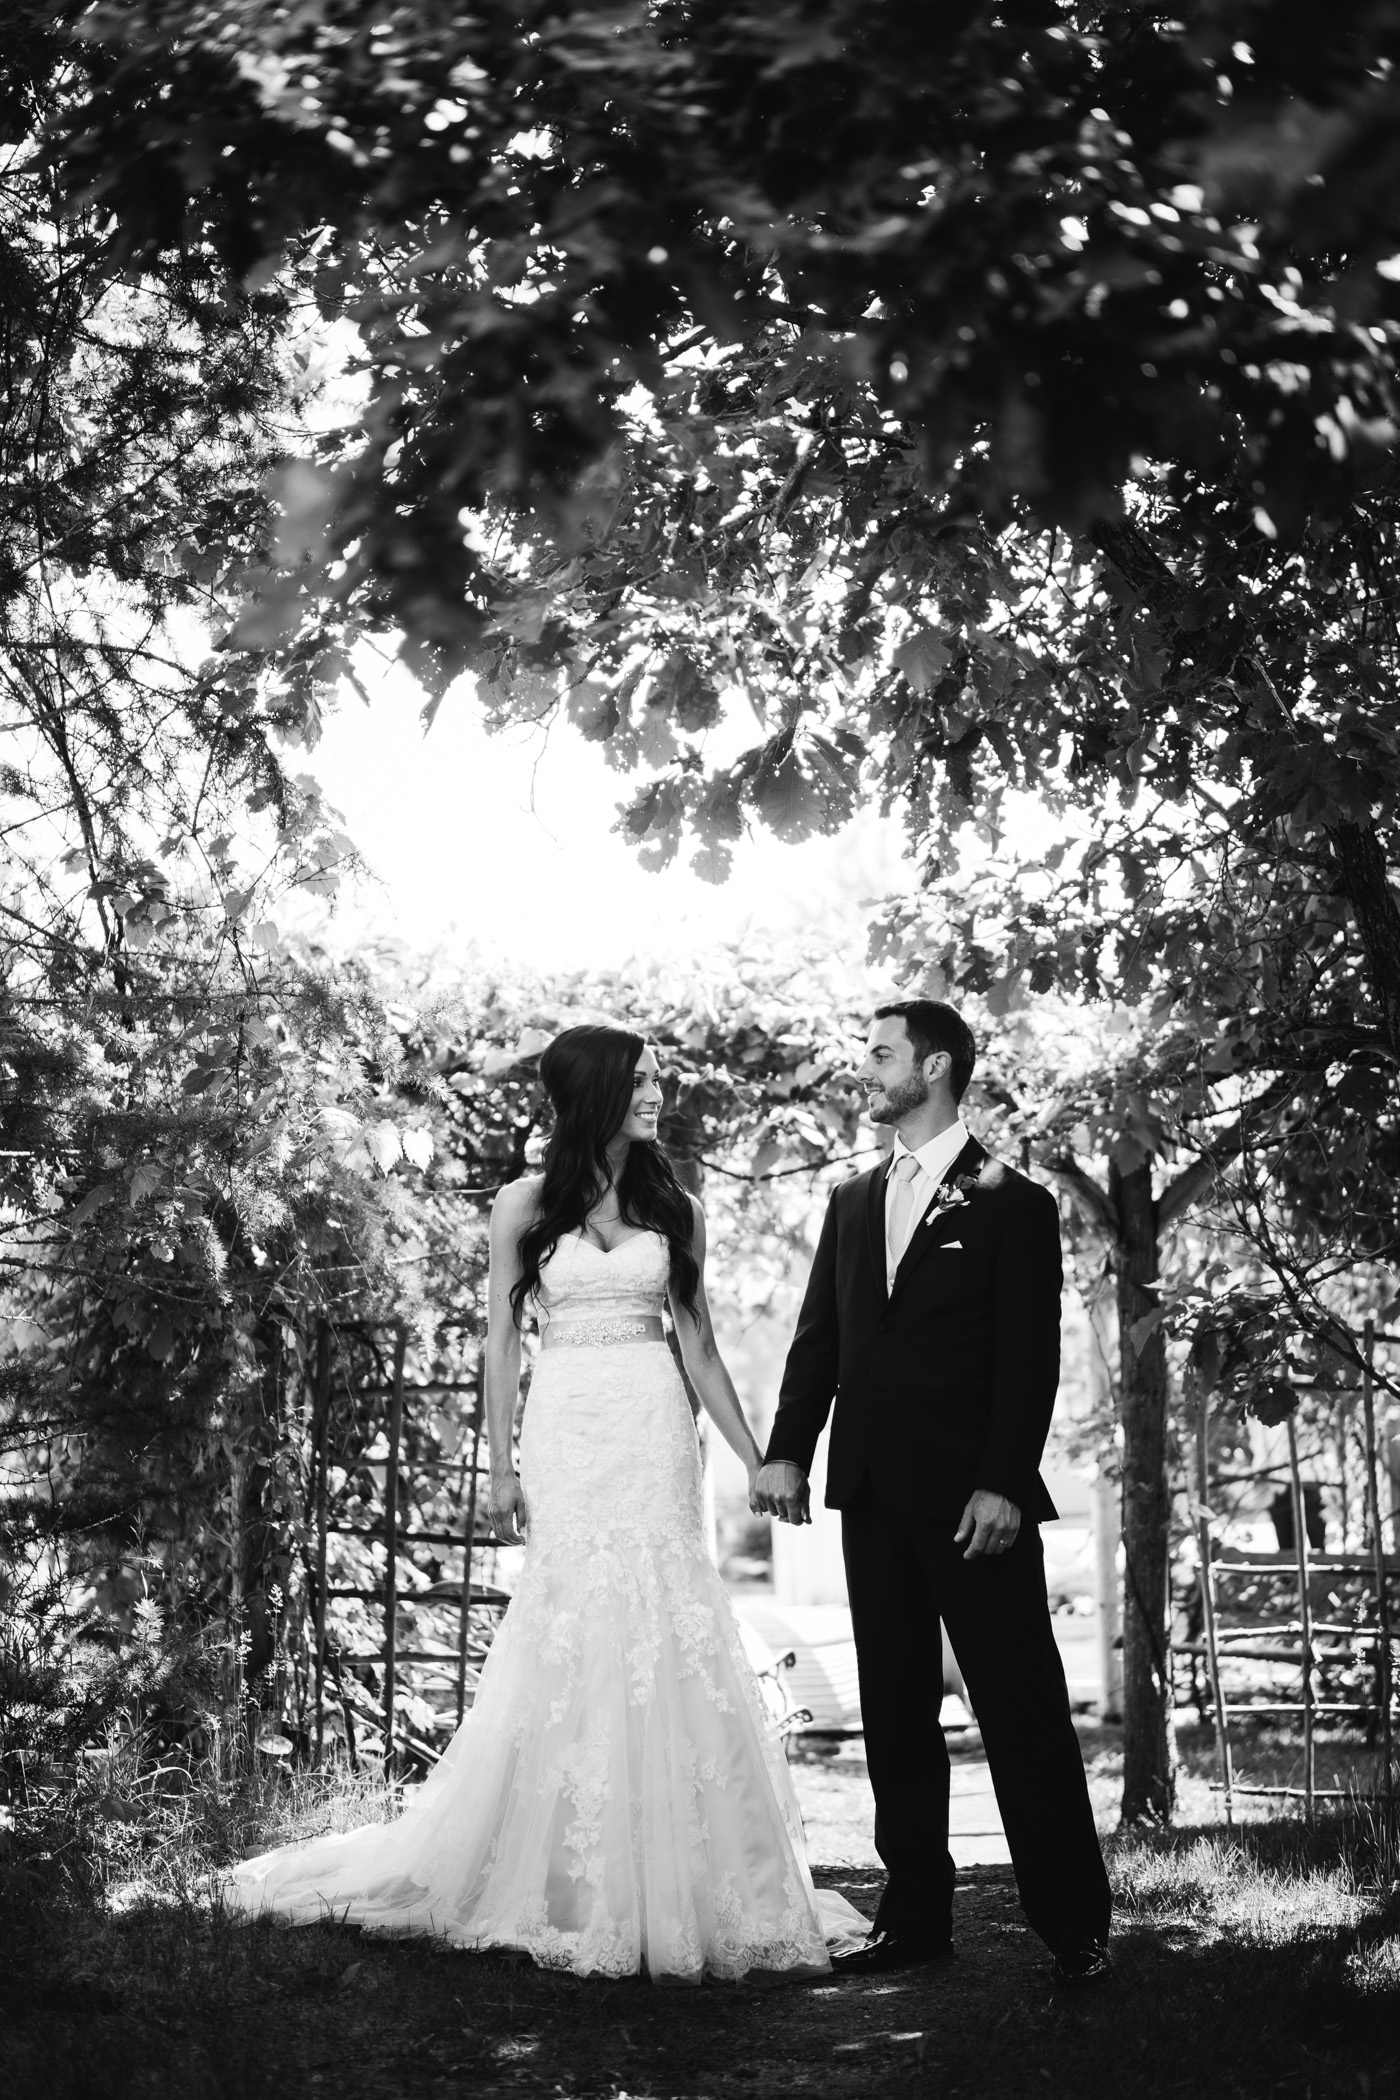 Hillary and Mark - Pineridge Hollow Wedding - Cojo Photo-1291.jpg